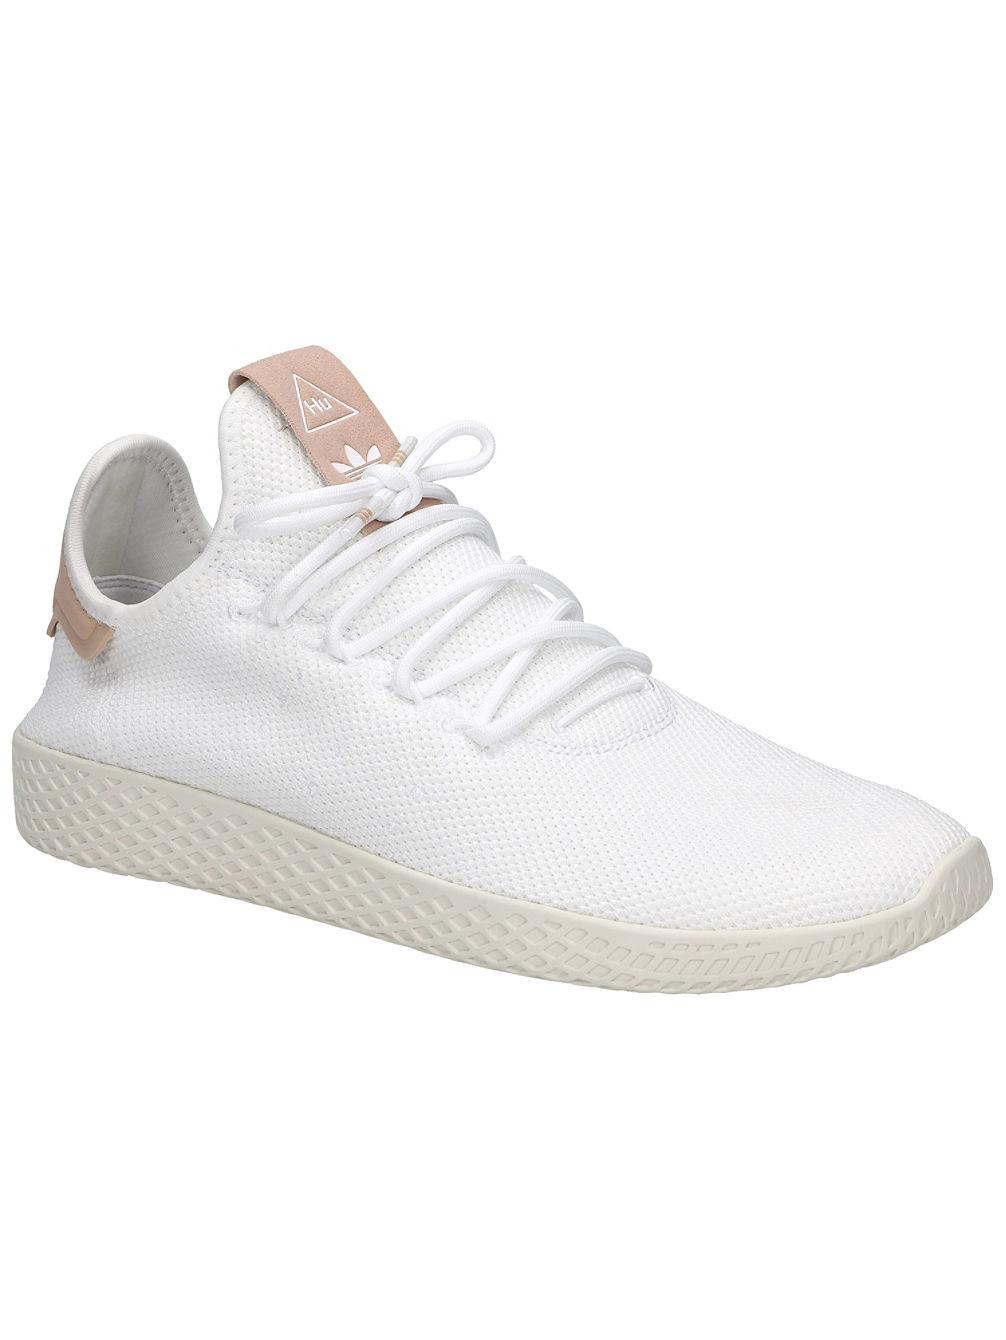 online retailer d9935 c543d Pharrel Williams Tennis HU Sneakers. adidas Originals